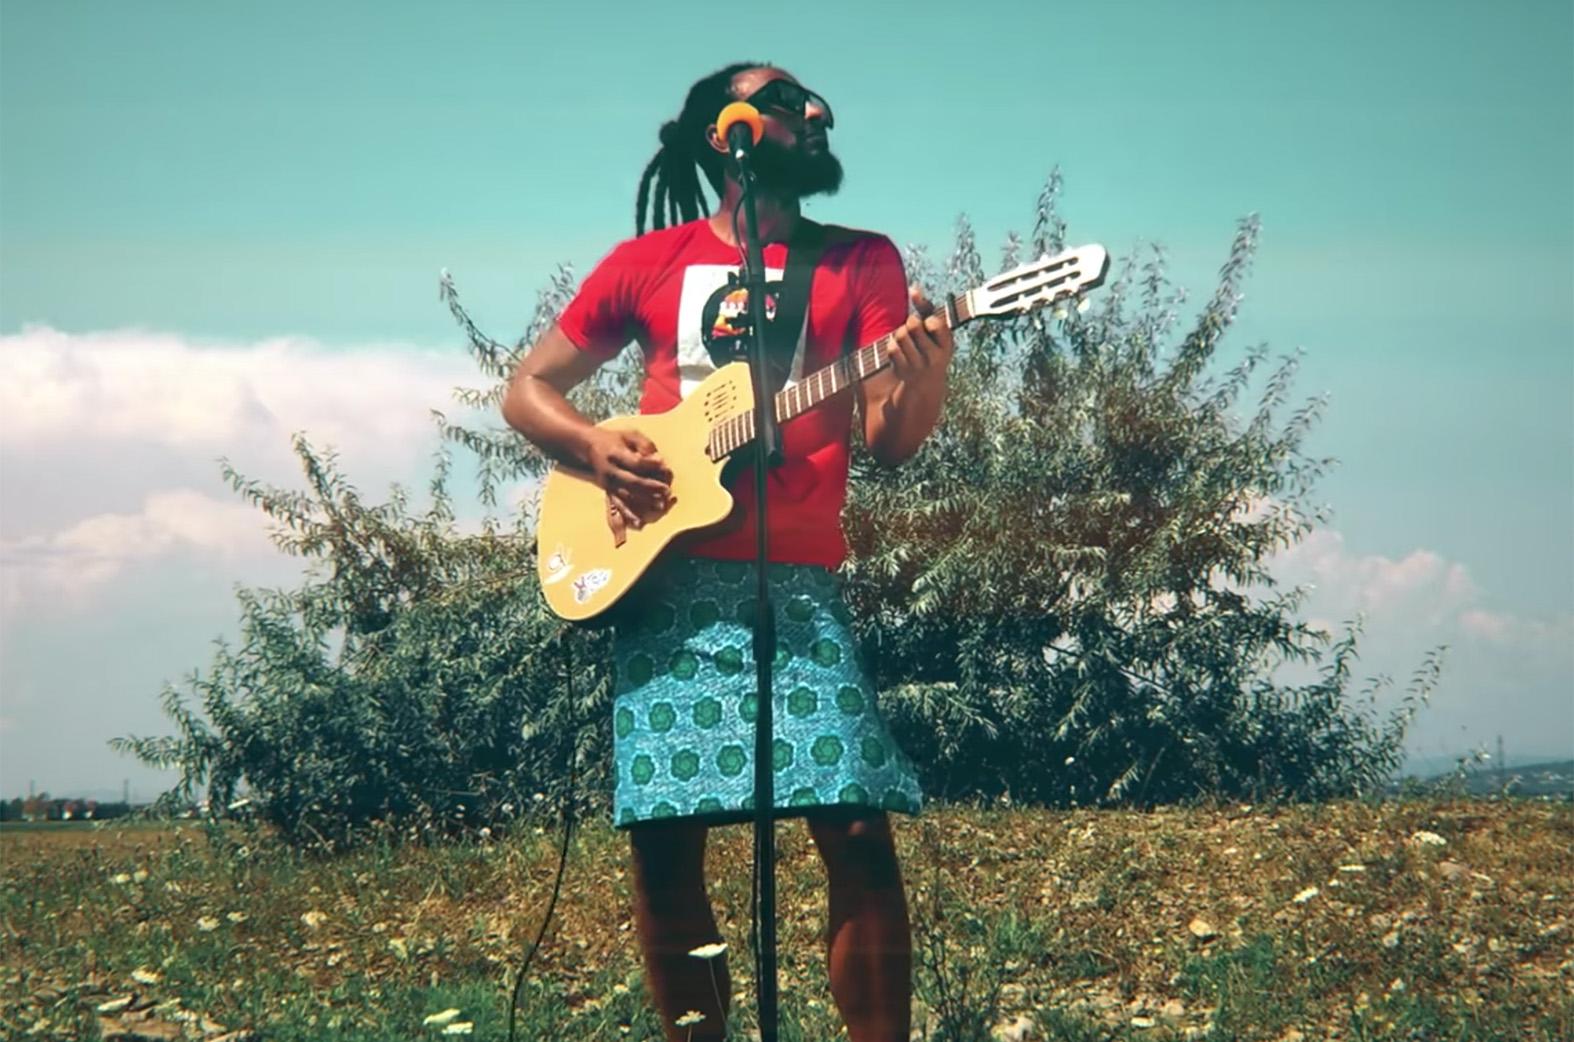 Video: Casa Mea by Wanlov the Kubolor